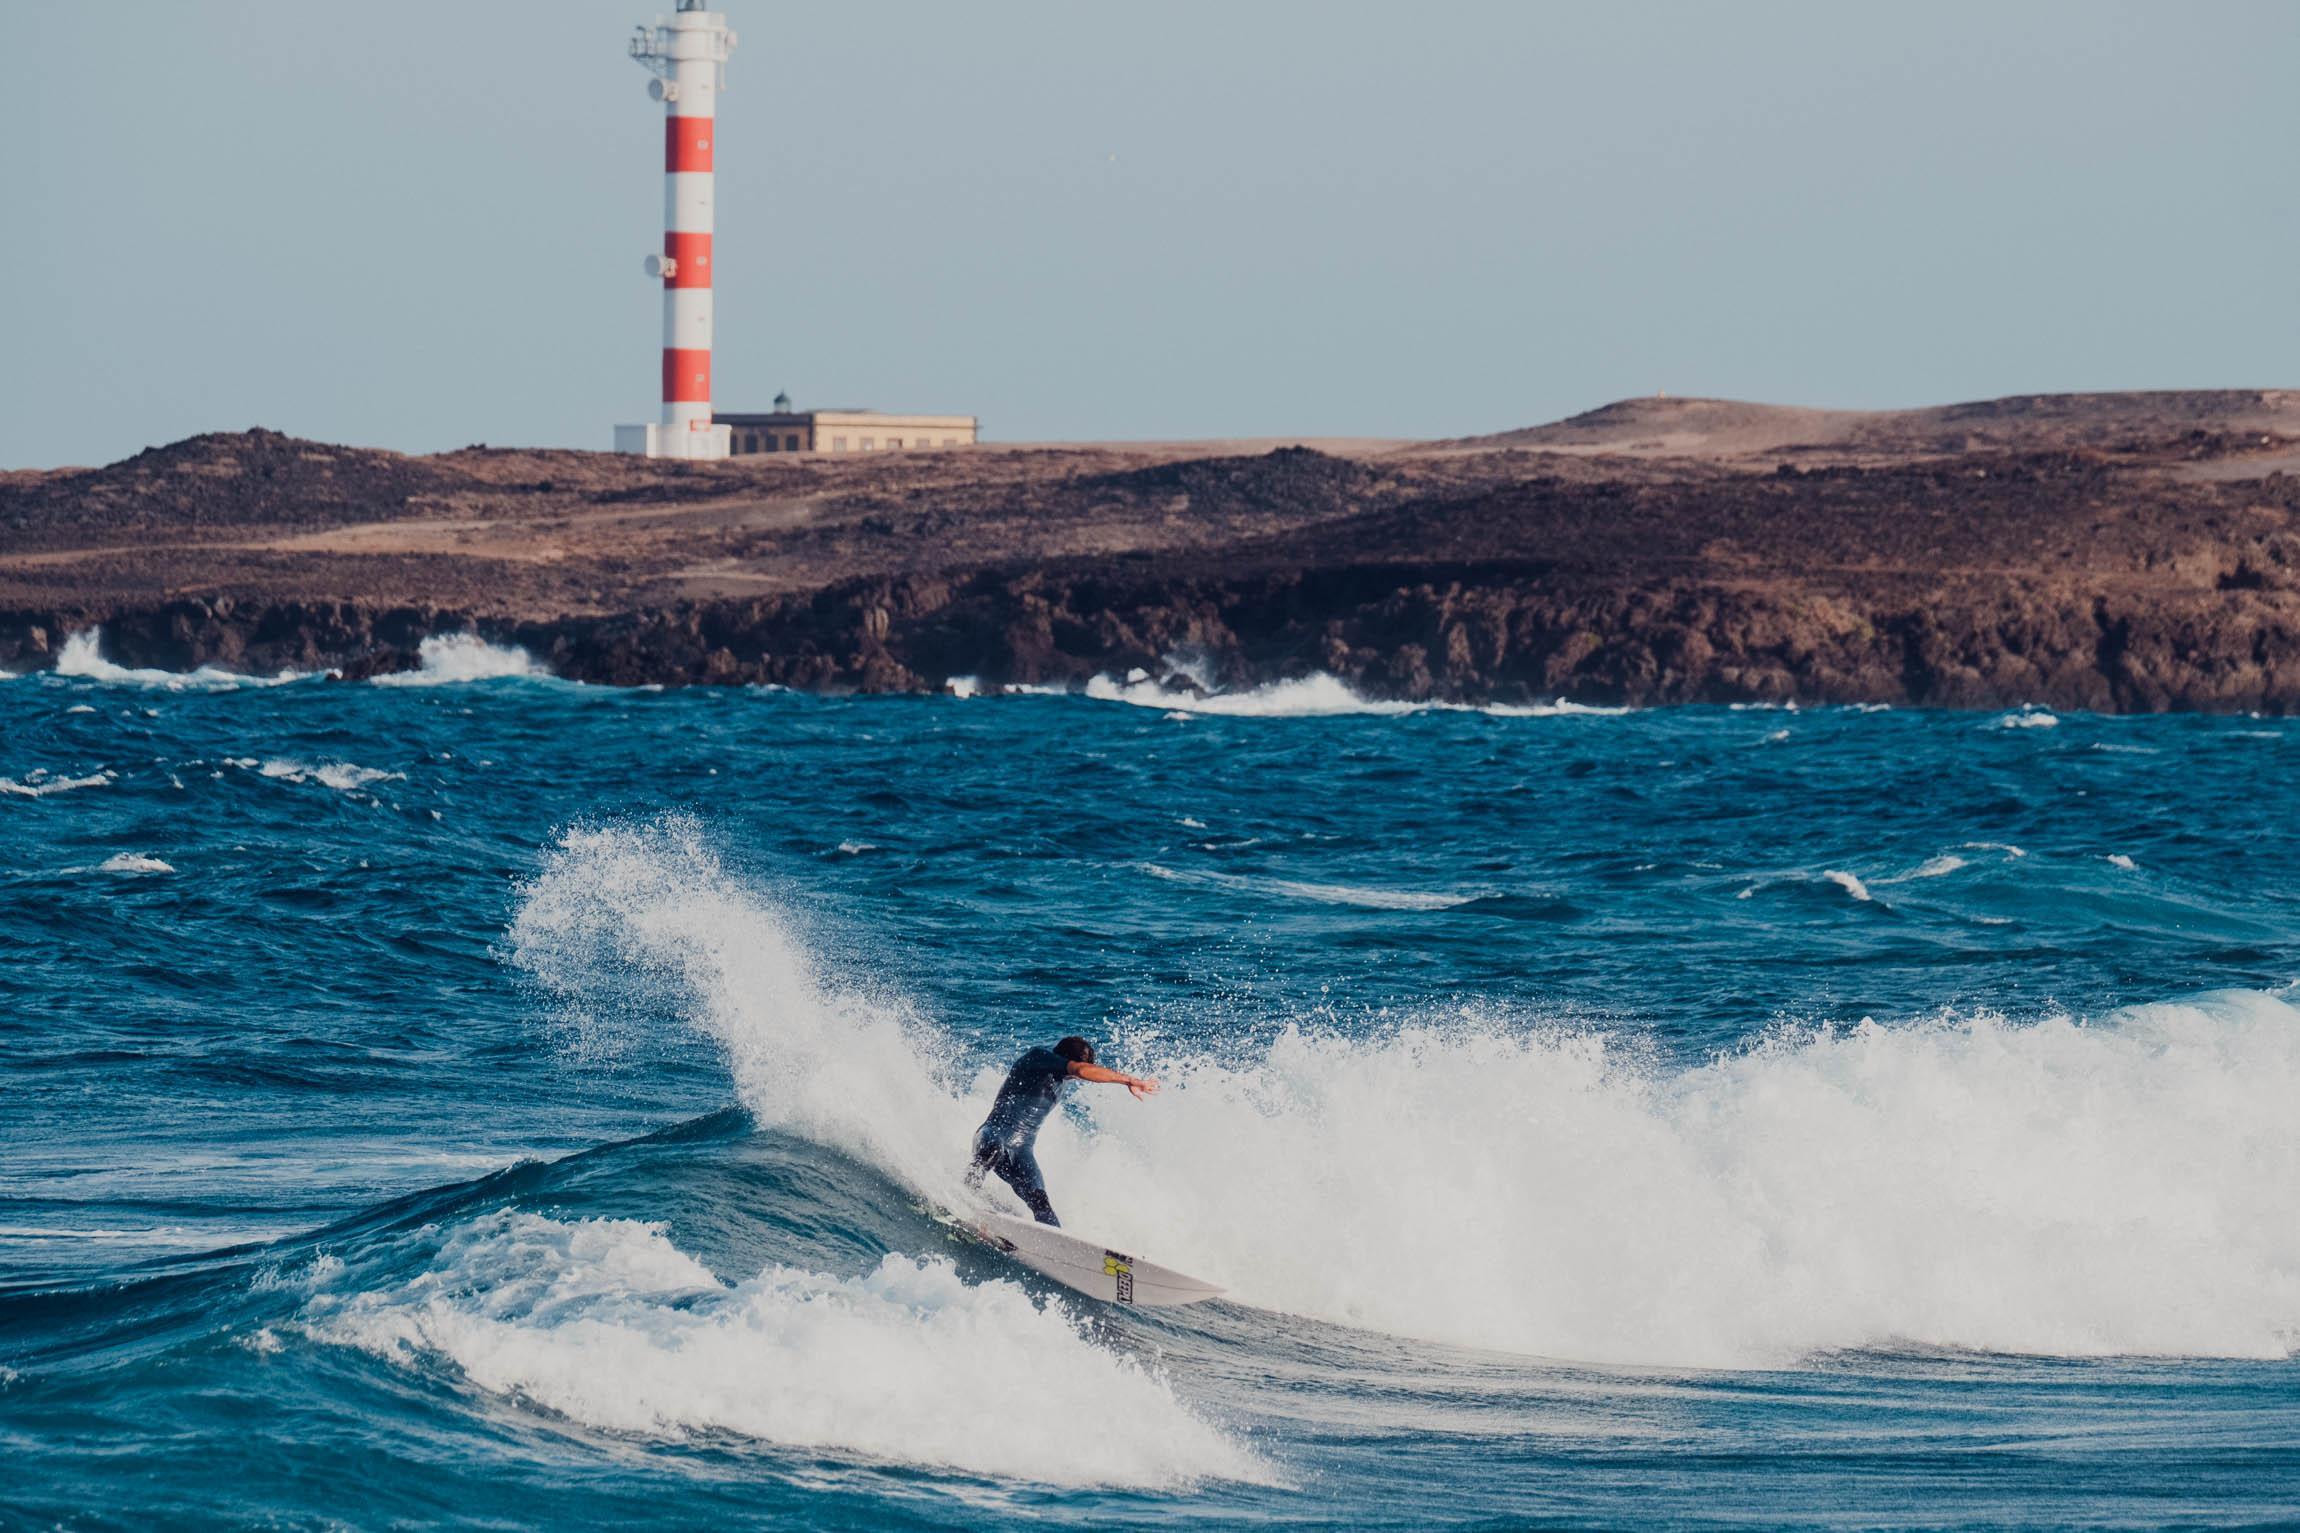 Surf Lesson in El poris